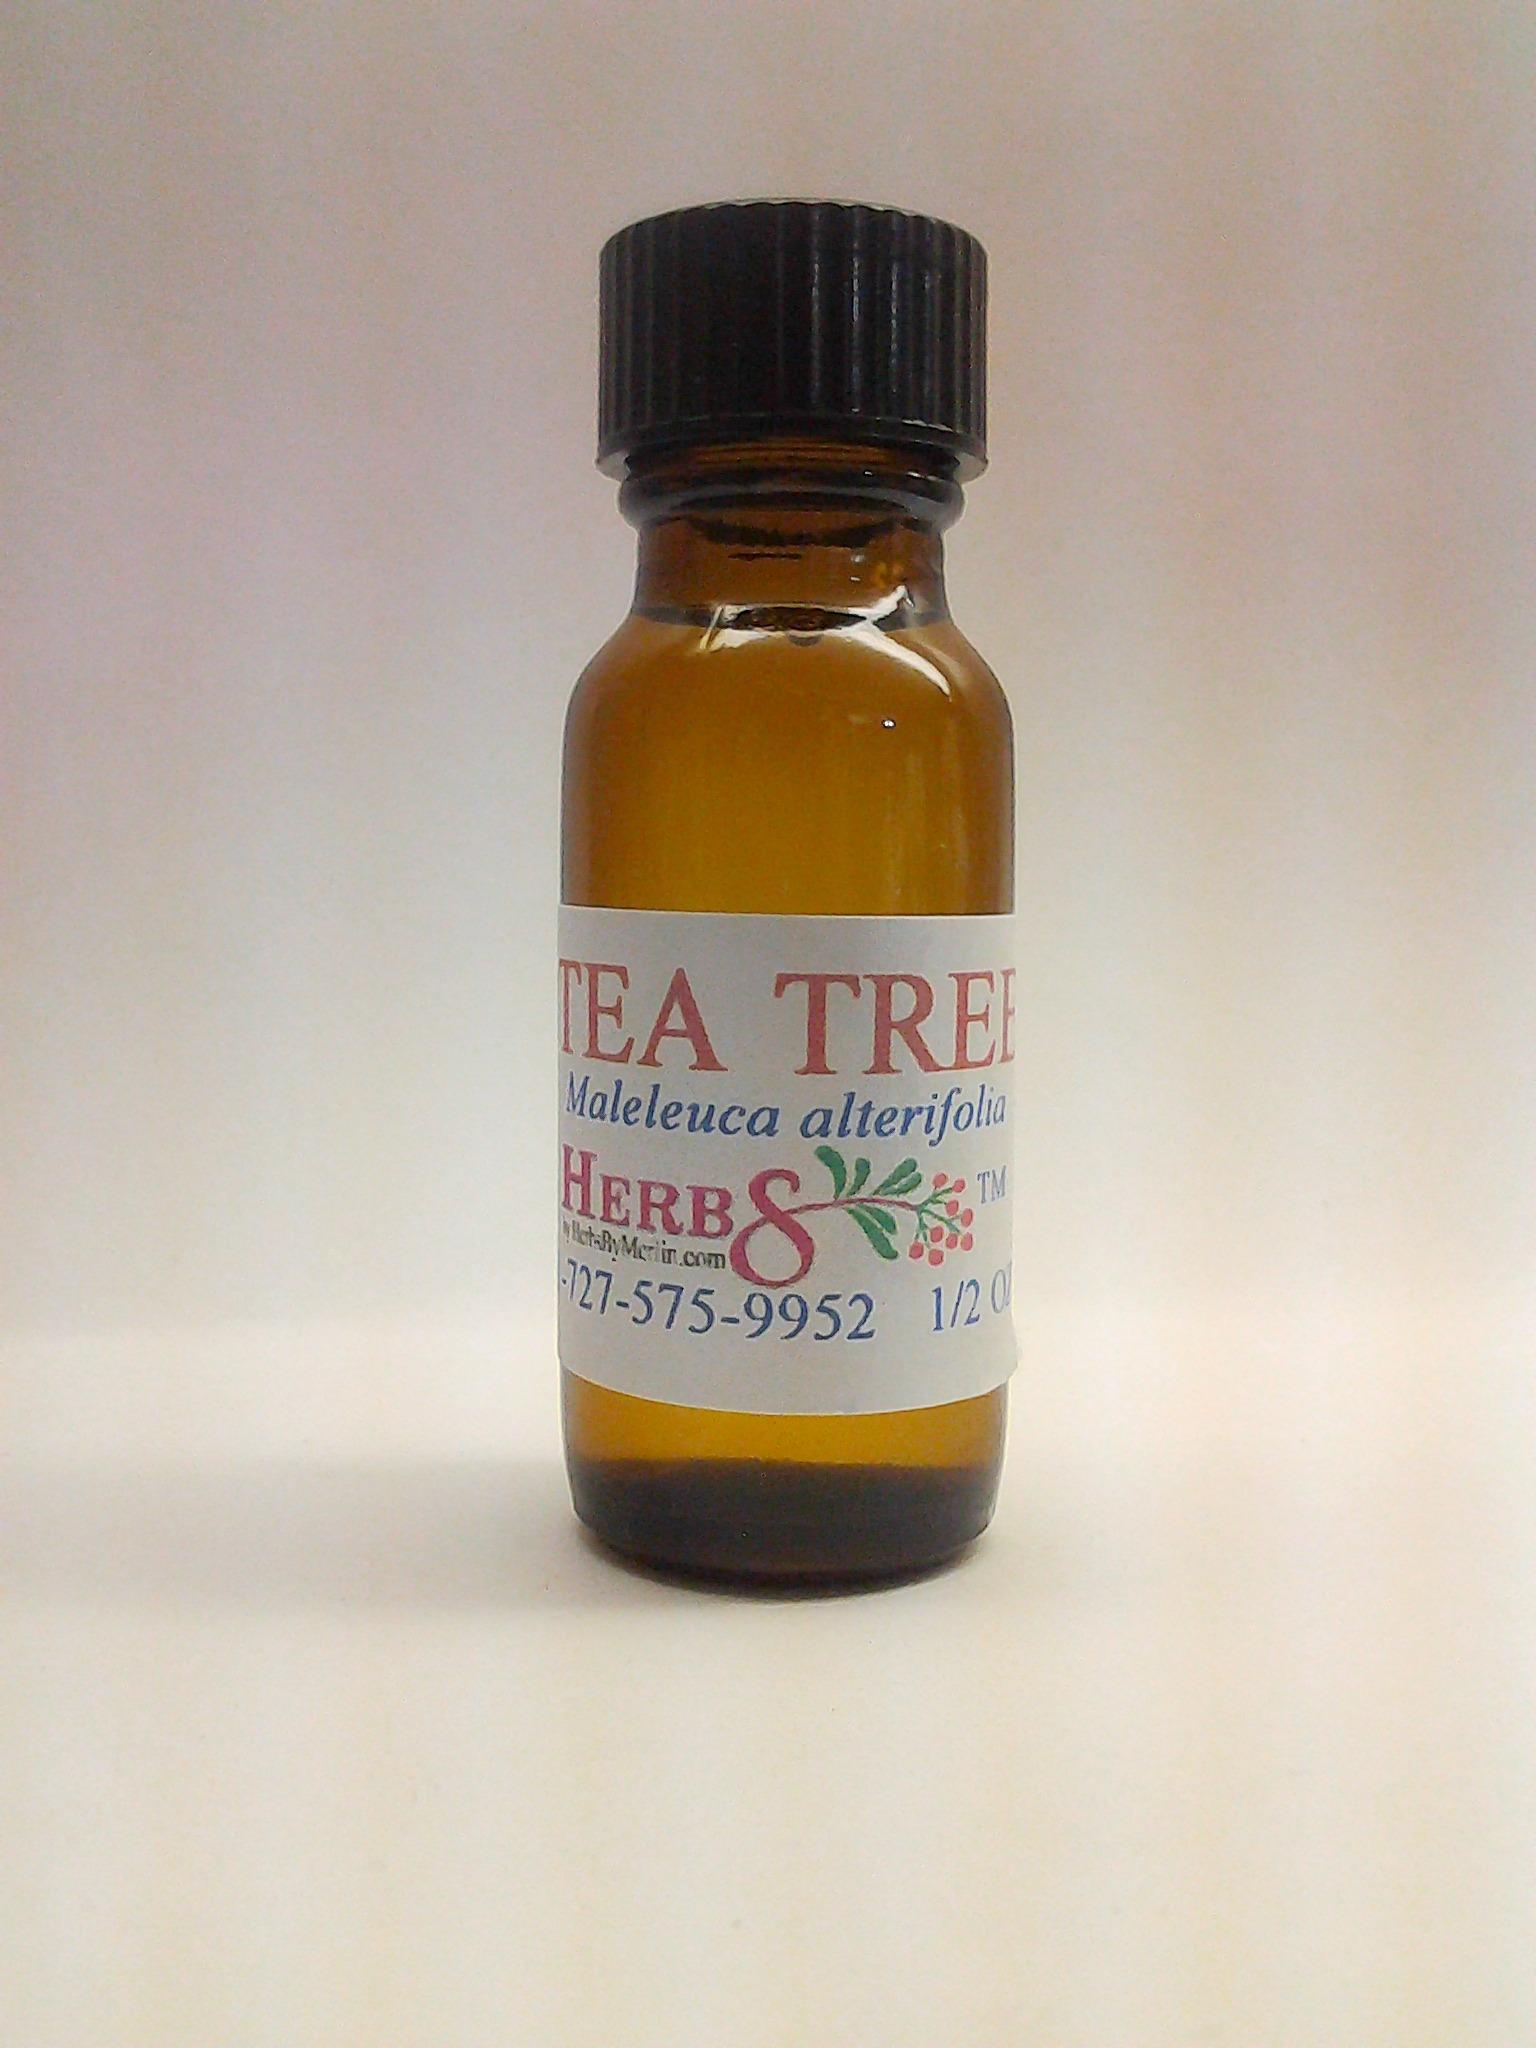 Herbs By Merlin Tea Tree Essential Oil 1/2 ounce (Melaleuca